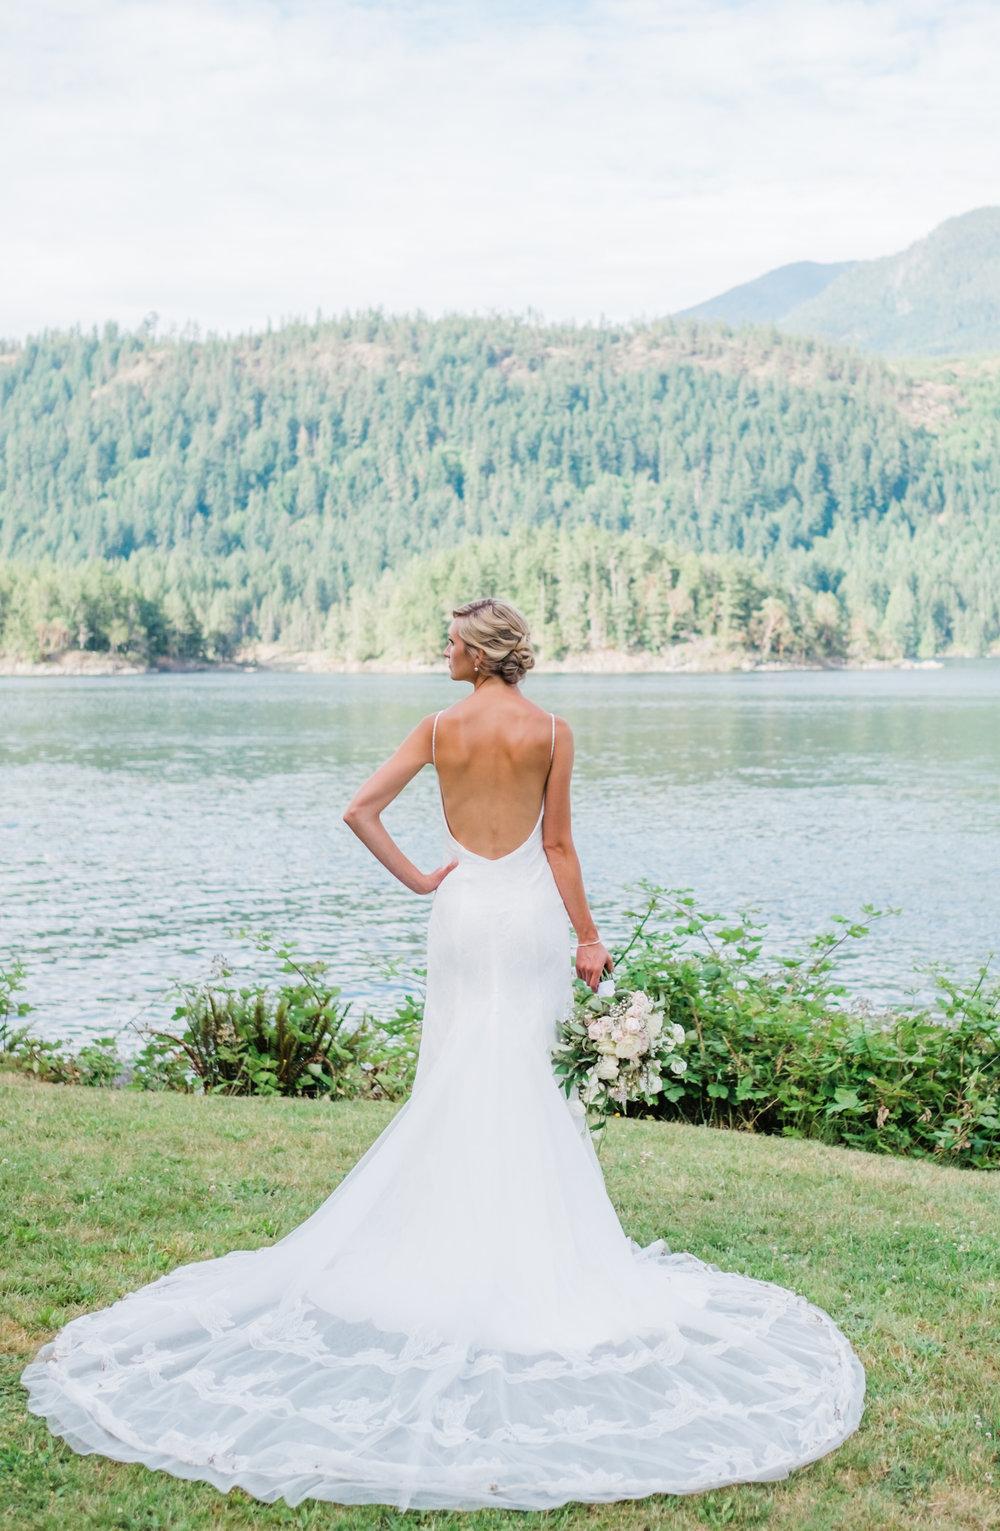 West Coast Wilderness Lodge Wedding - Mary and Matt - Sunshine Coast Wedding Photographer - Jennifer Picard -DSCF1044.jpg